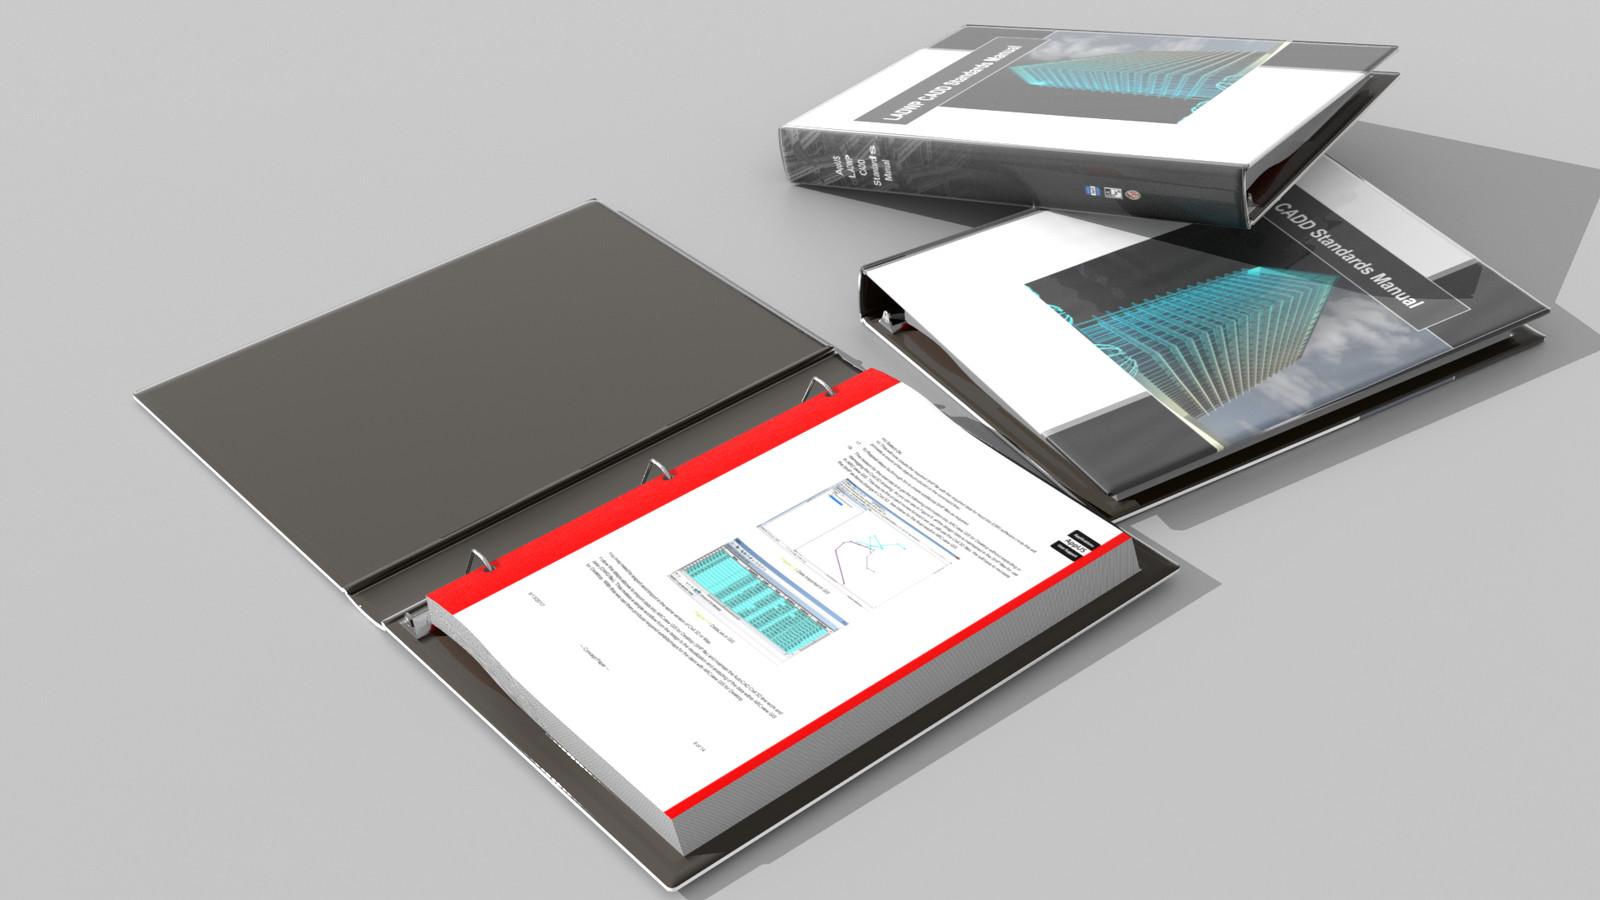 Pre-viz of potential technical document design for same client.